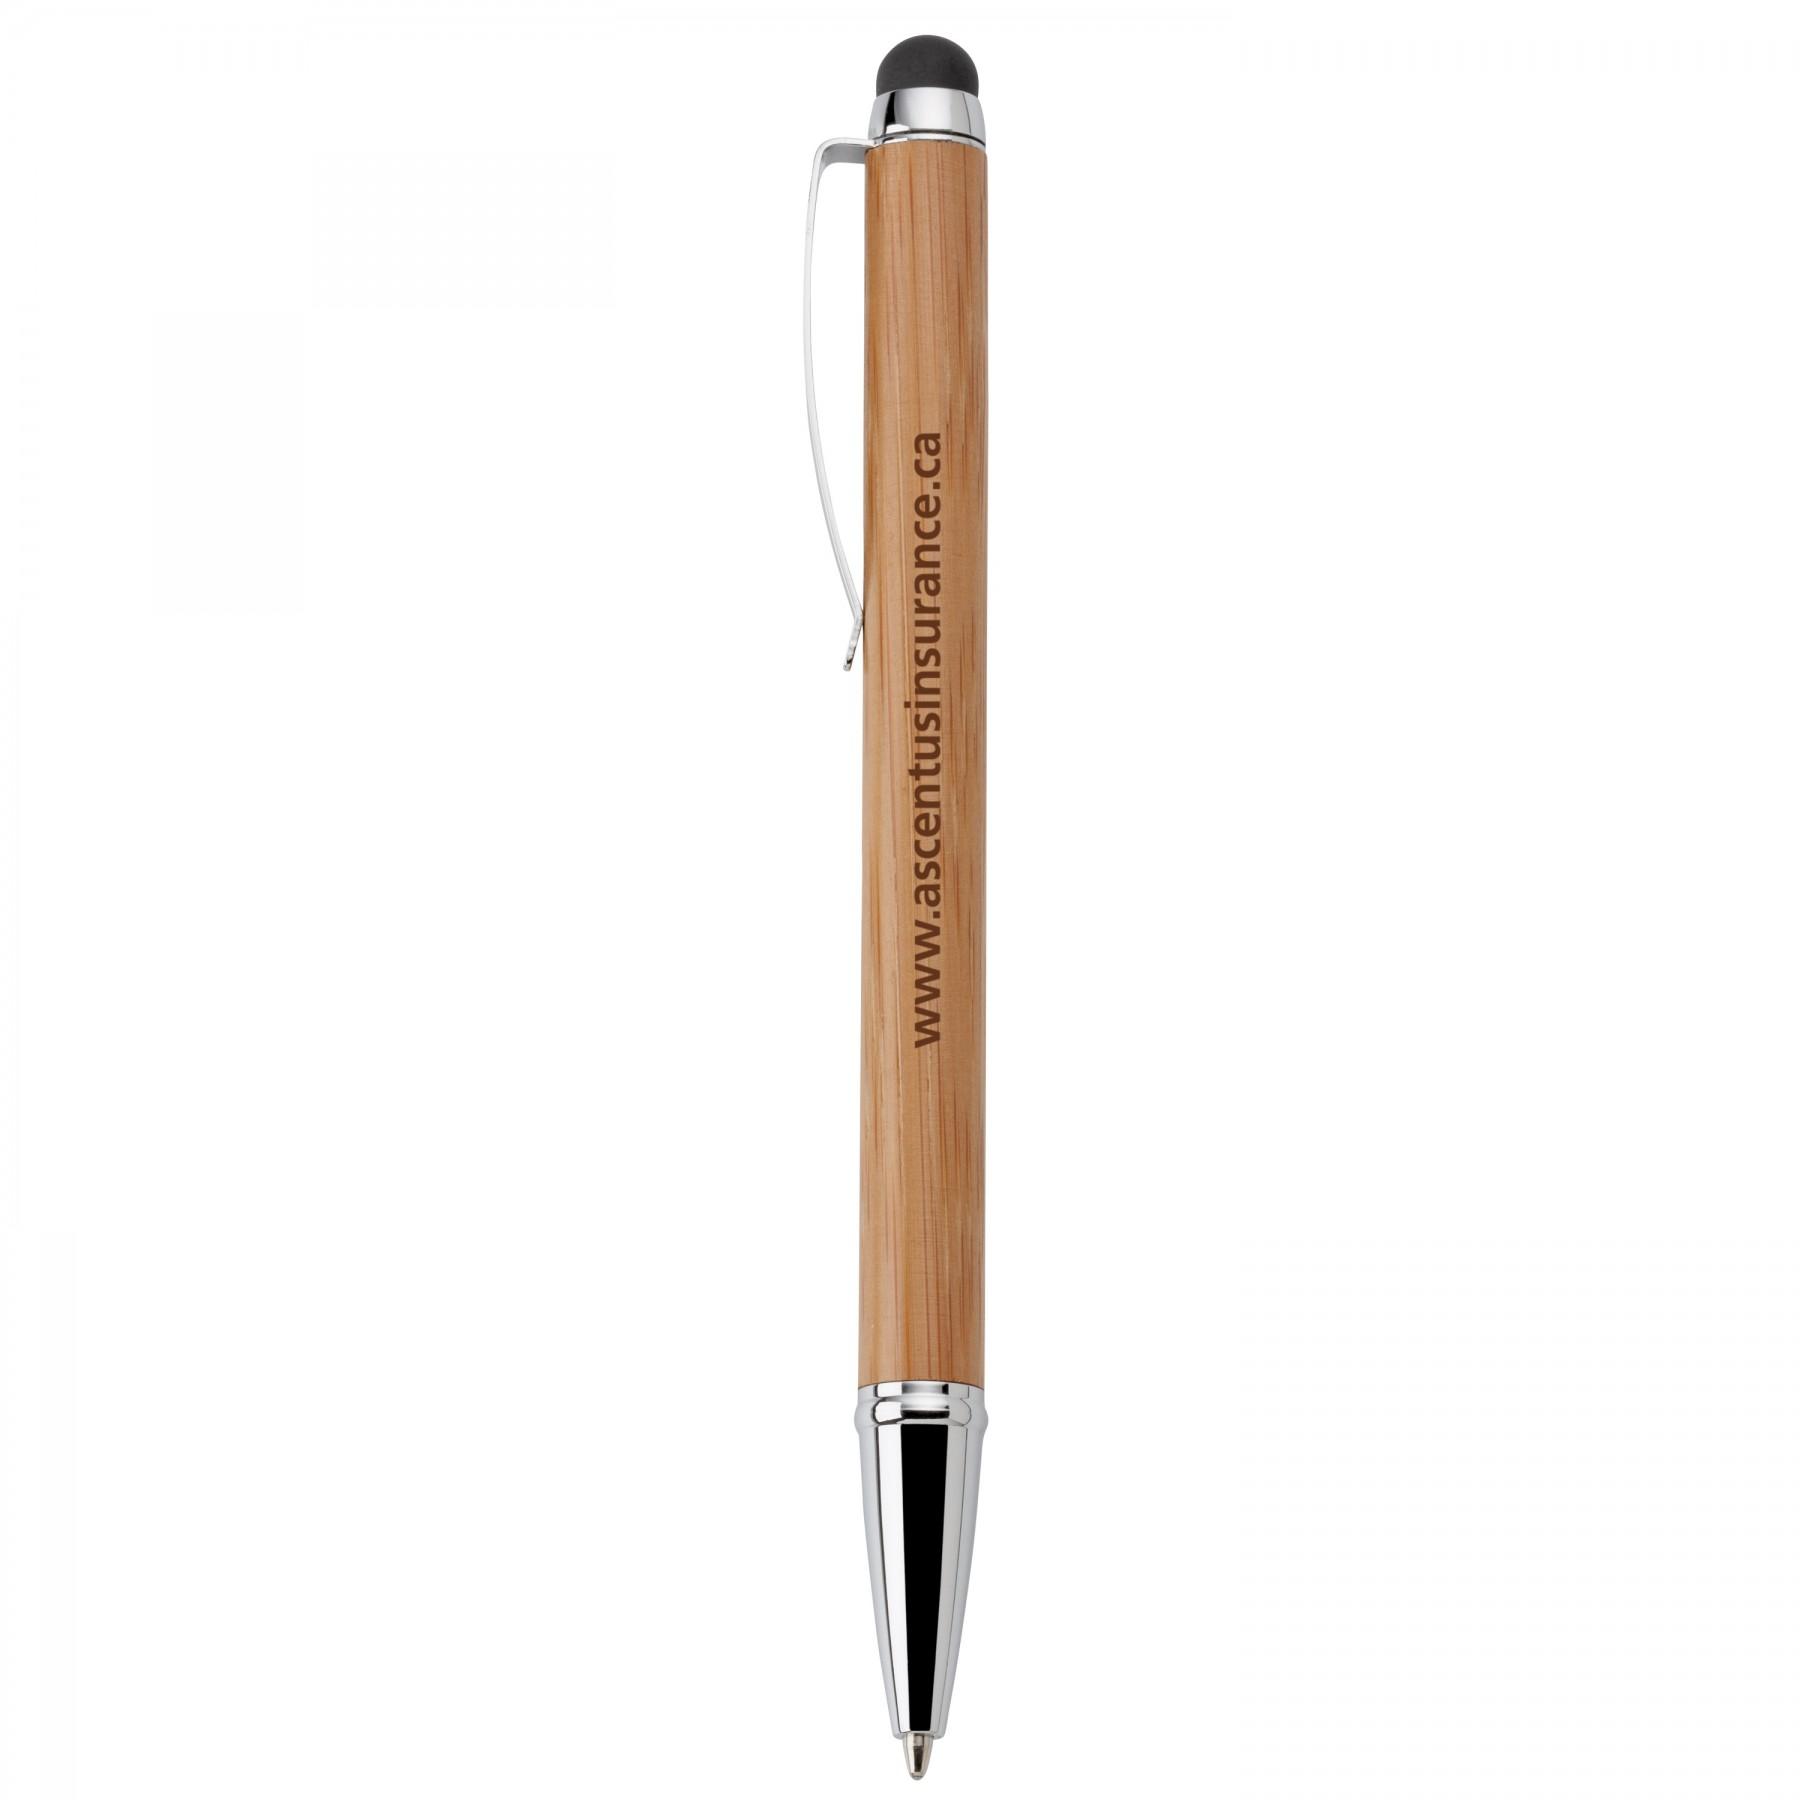 Asia Mini Pen/Stylus, EC127, Laser Engraved